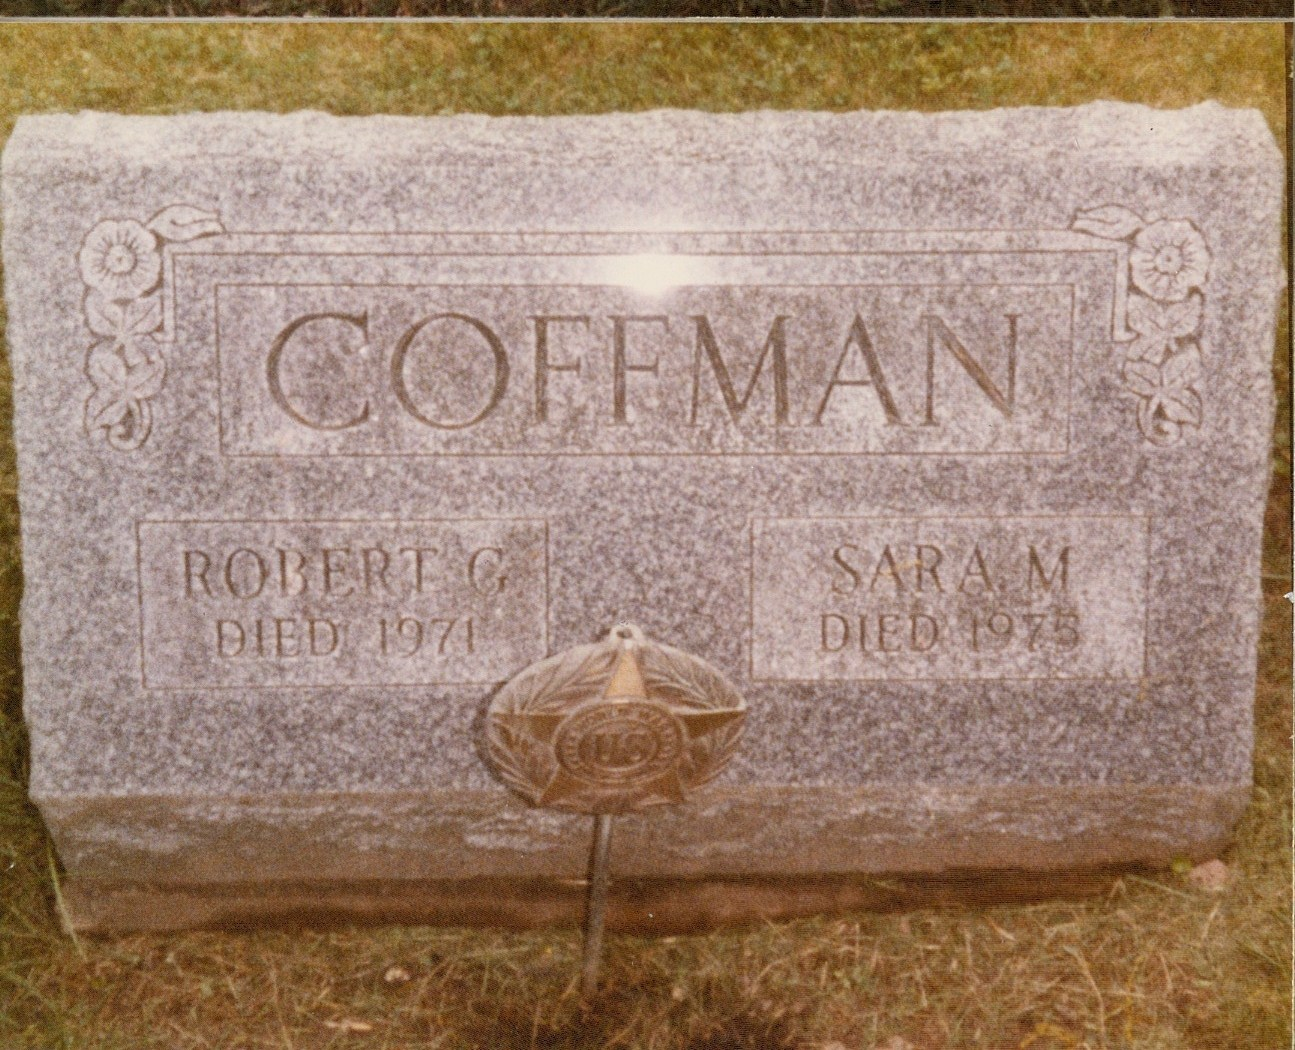 Robert Grant Coffman